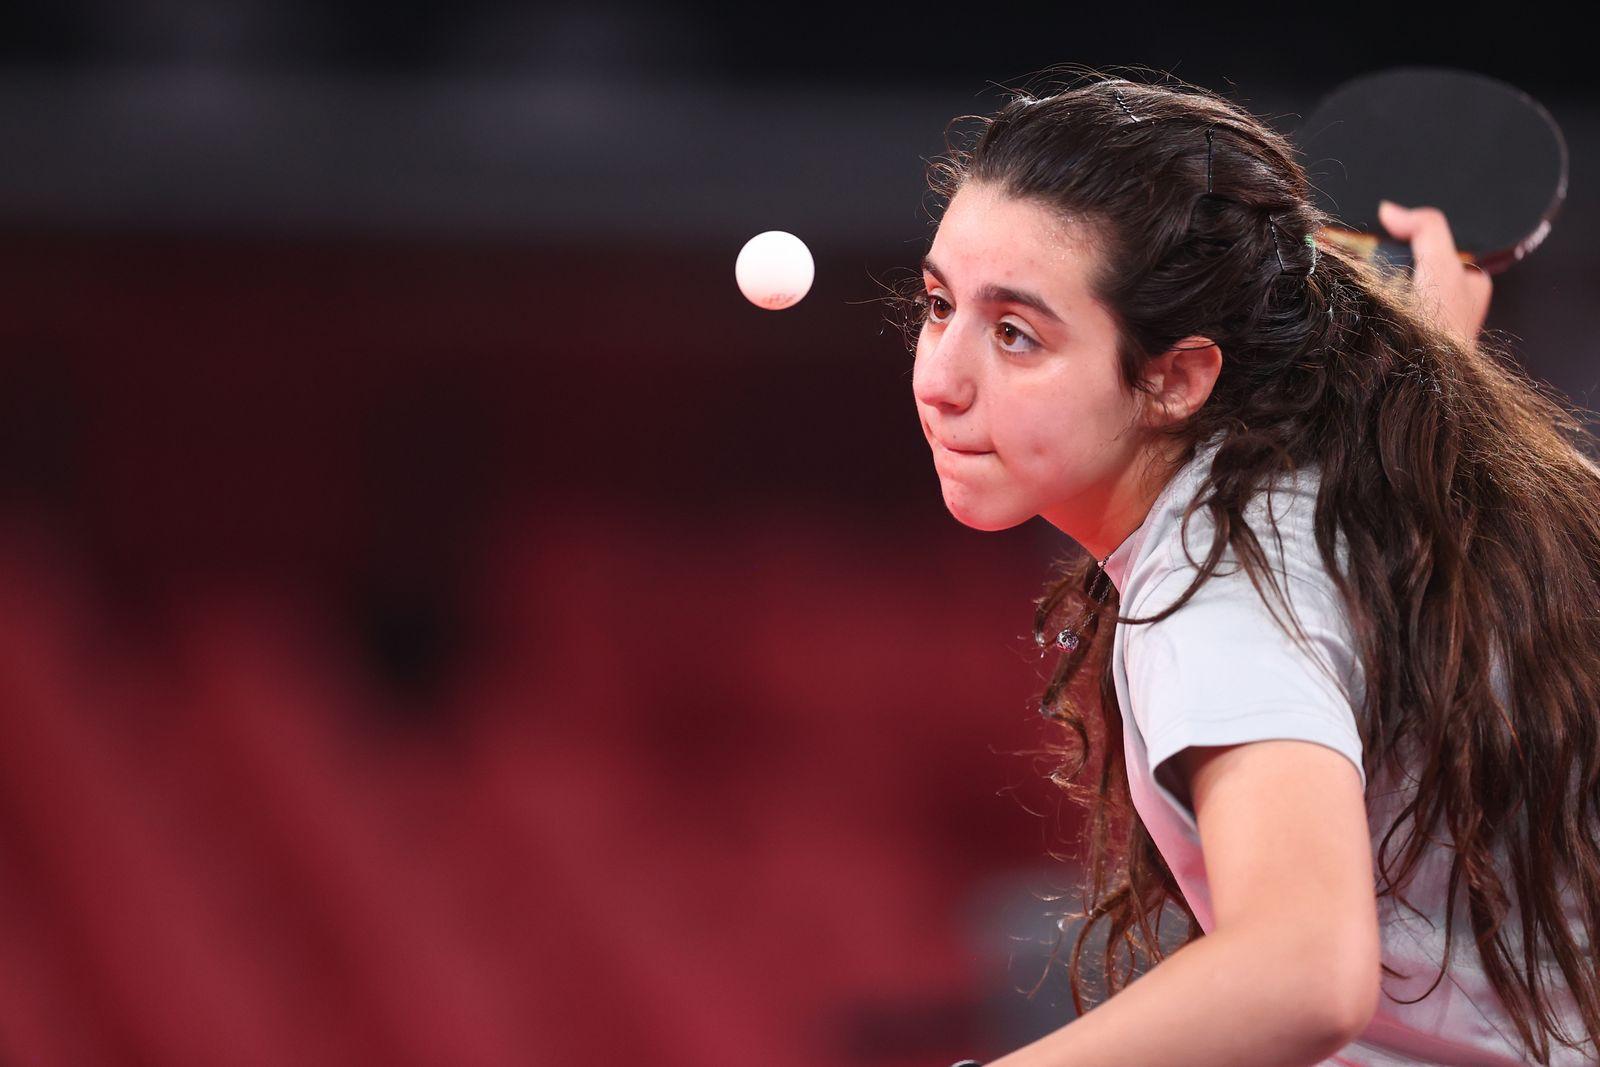 Table Tennis - Women's Singles - Preliminary Round